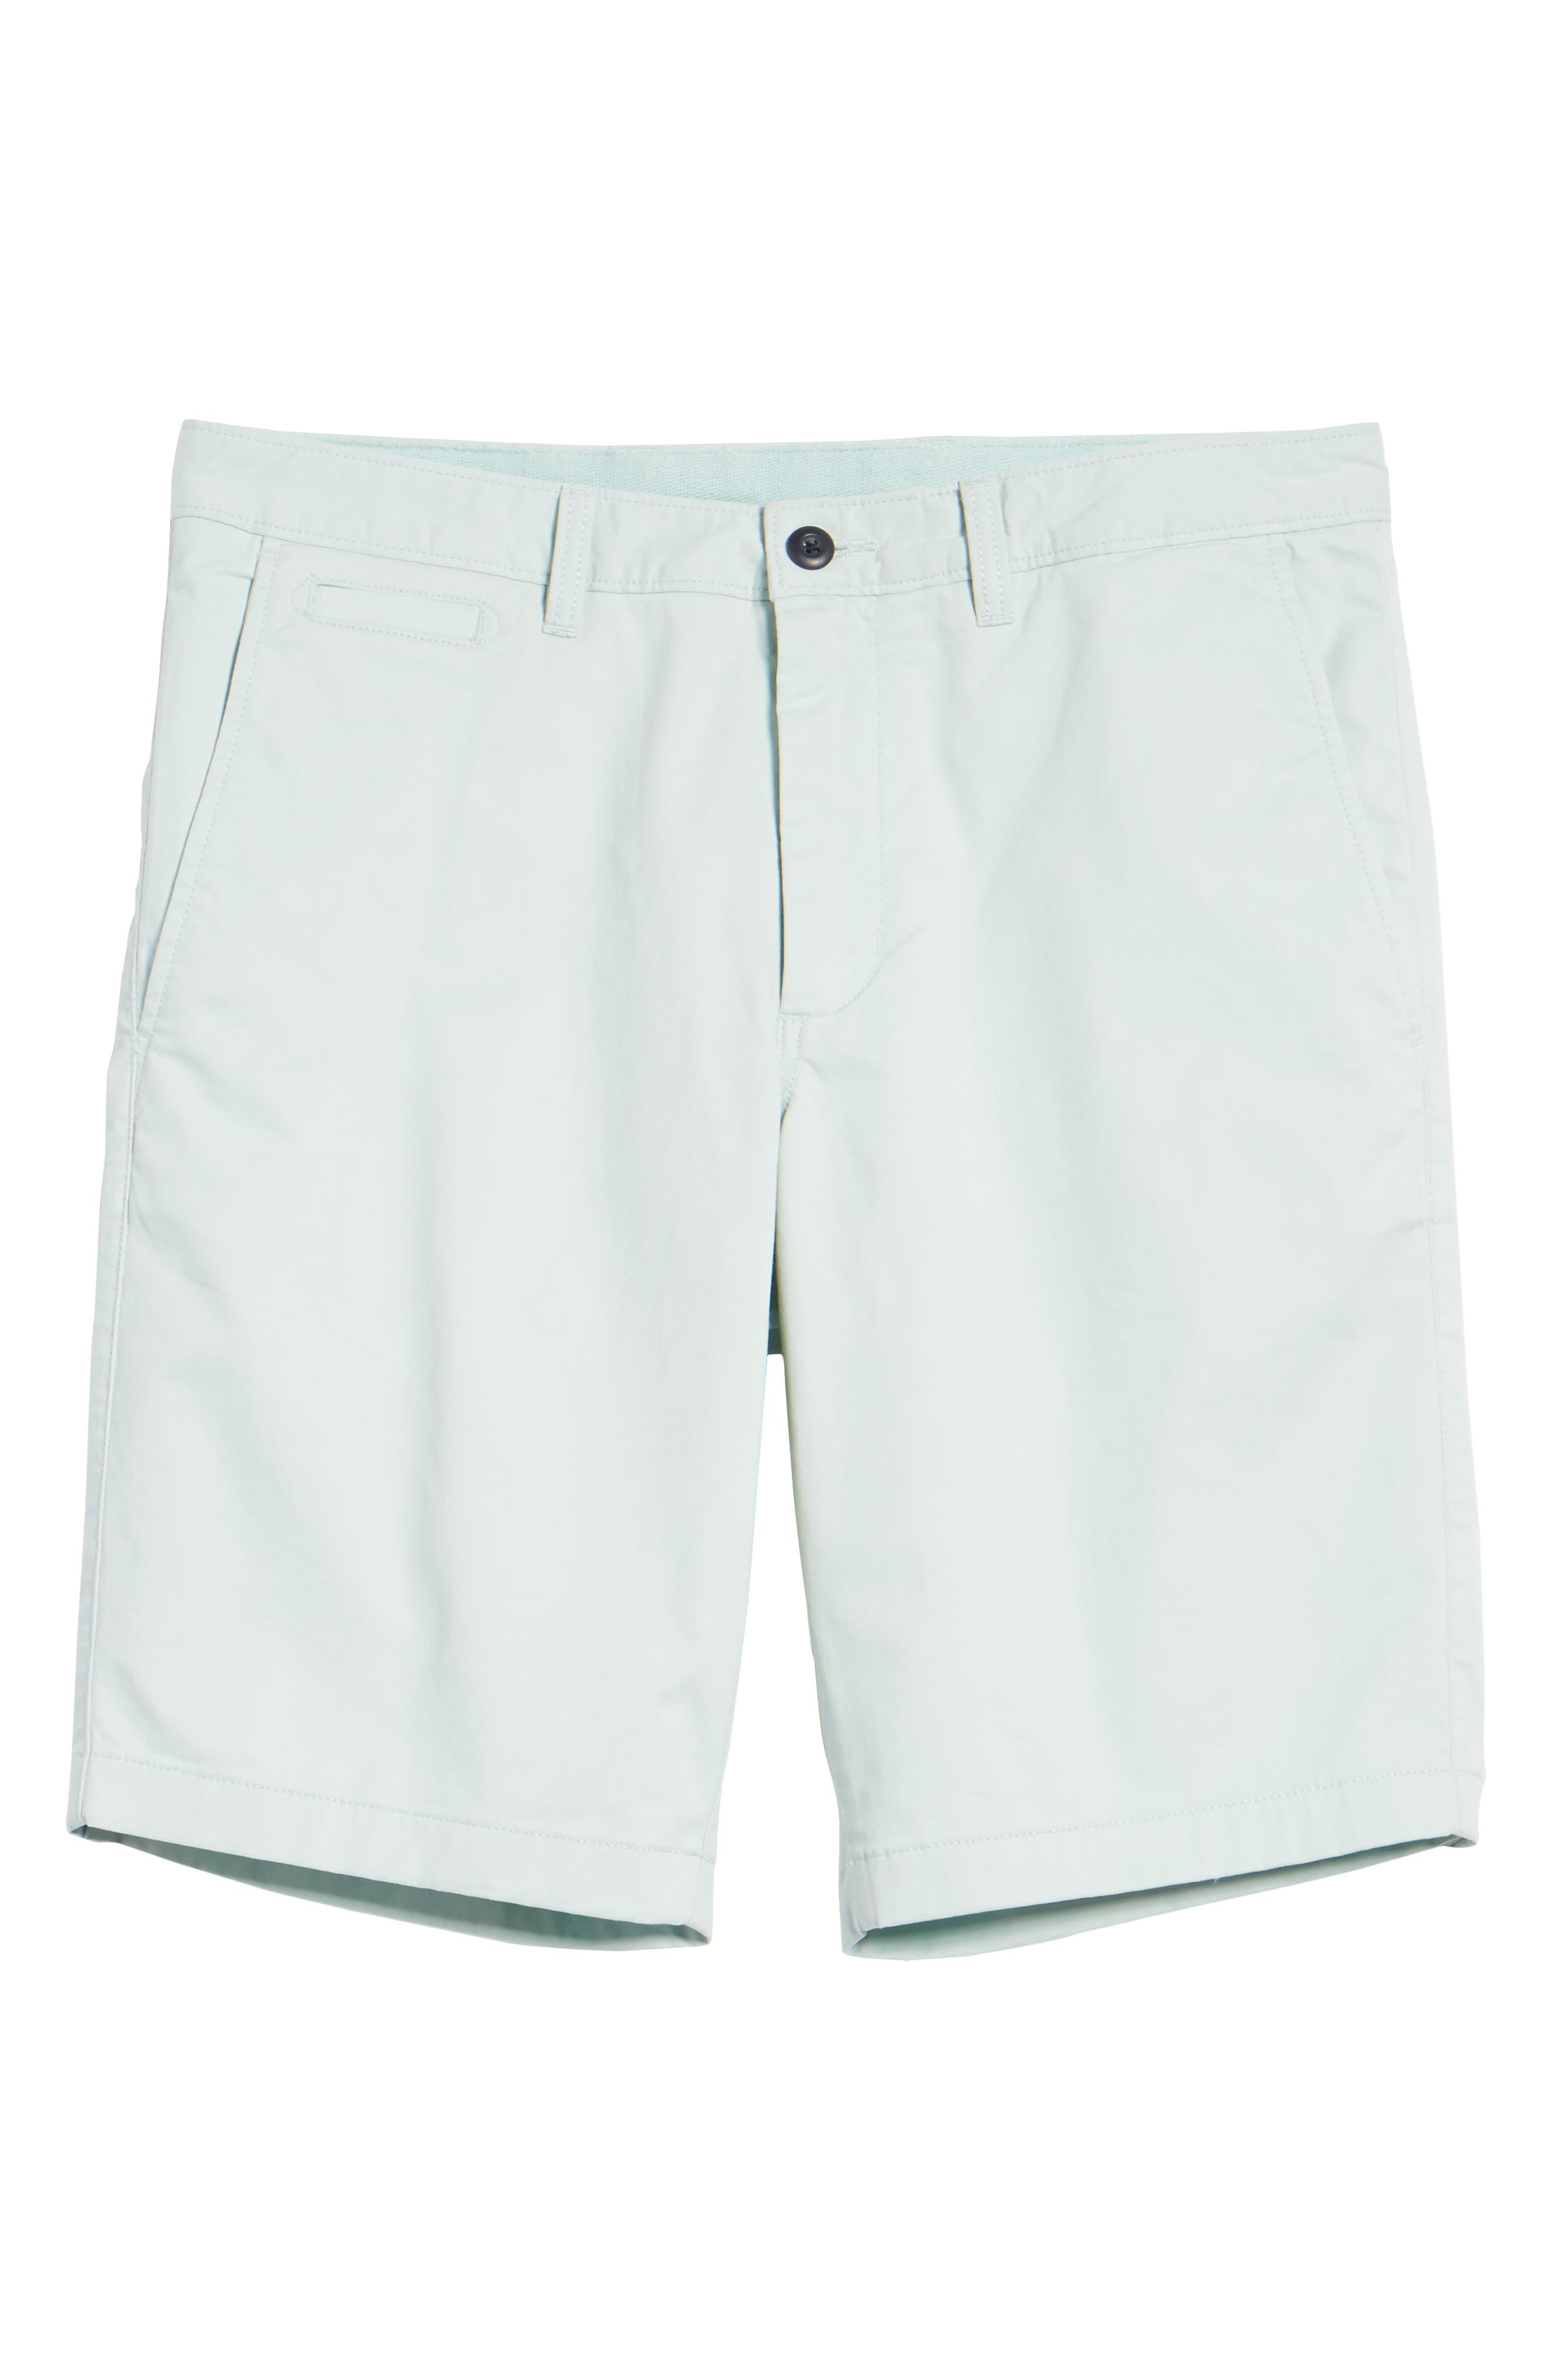 Ballard Slim Fit Stretch Chino 11-Inch Shorts,                             Alternate thumbnail 83, color,